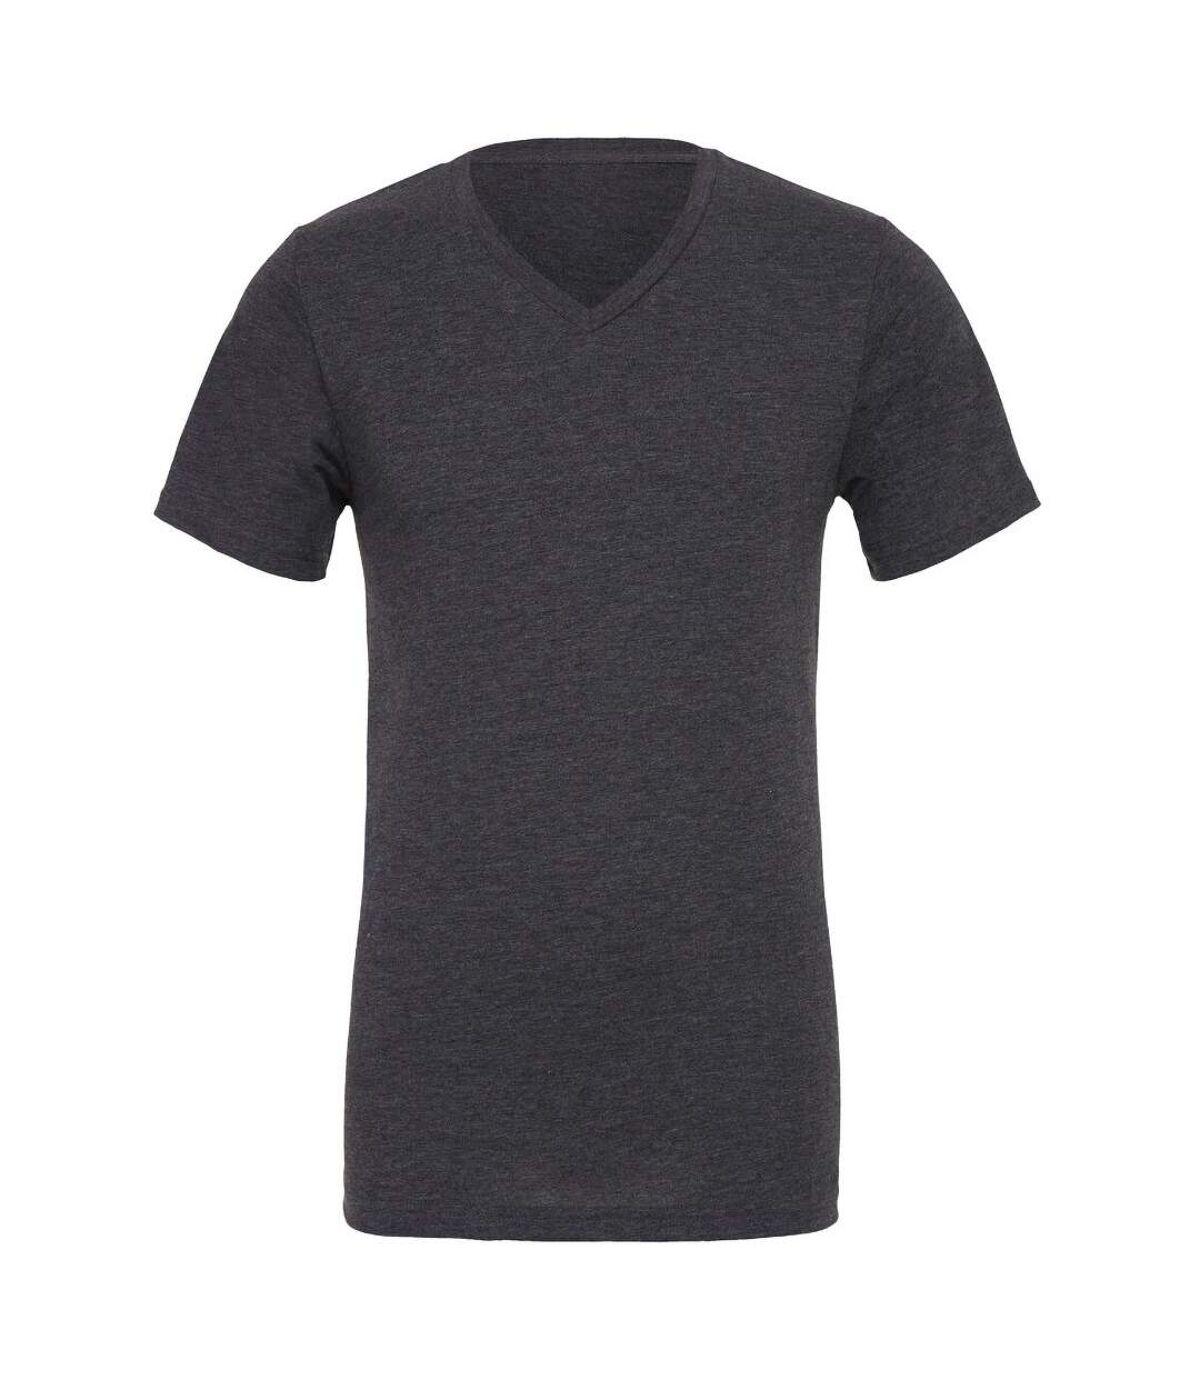 Canvas Mens Jersey Short Sleeve V-Neck T-Shirt (White) - UTBC2595